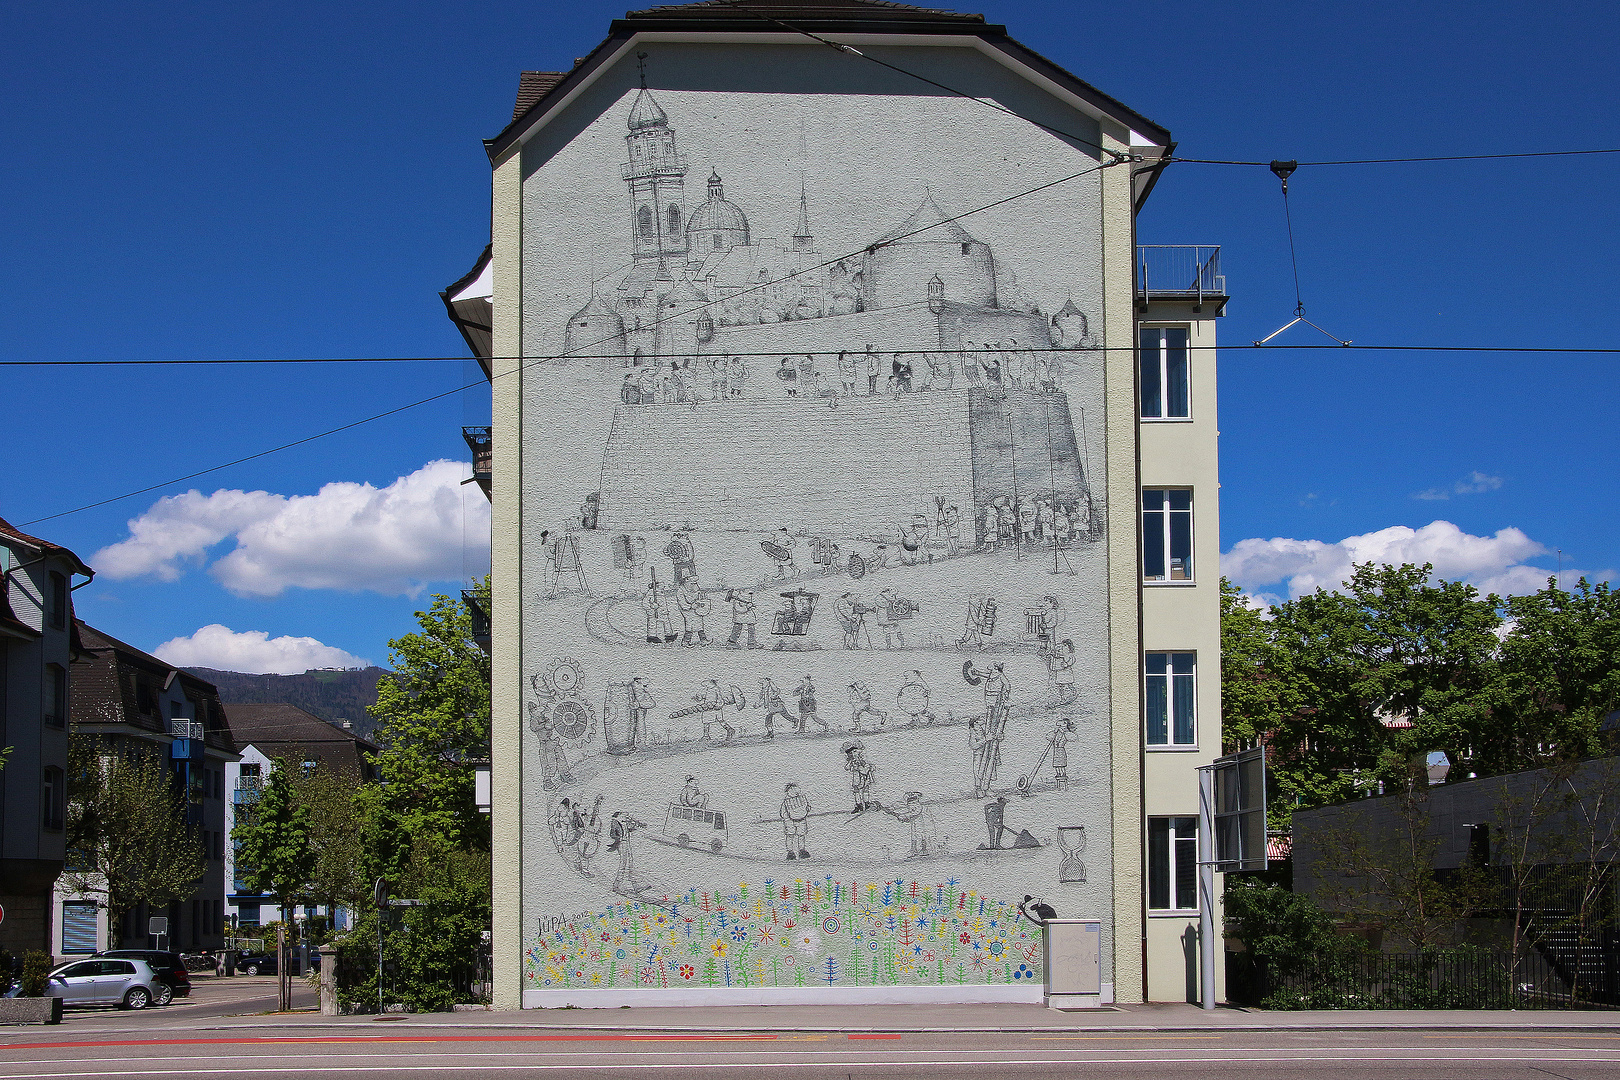 Solothurner auf dem Weg ins Paradis